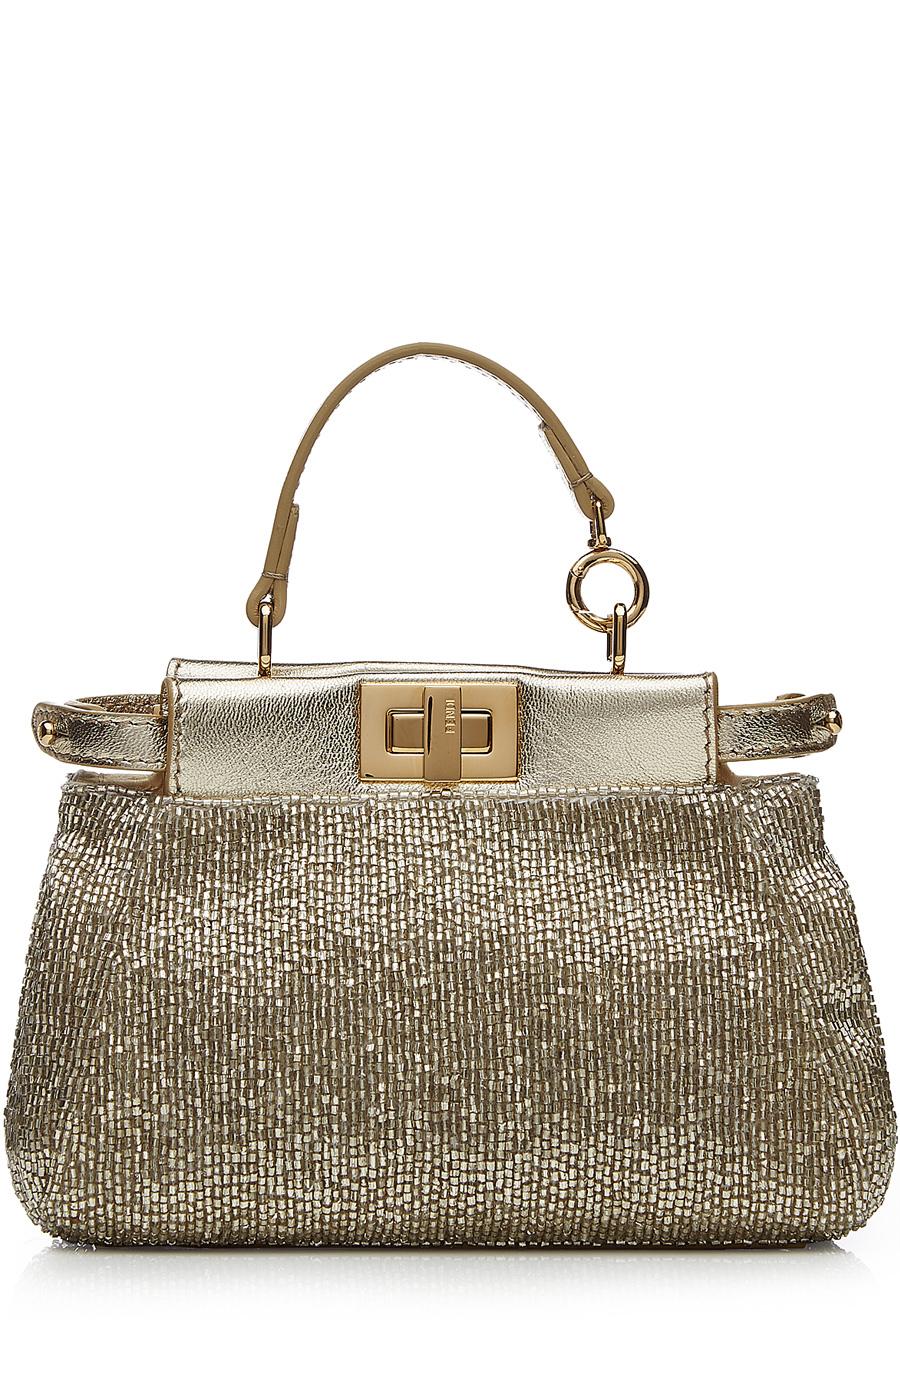 ad24351025c Fendi Embellished Micro Peekaboo Bag